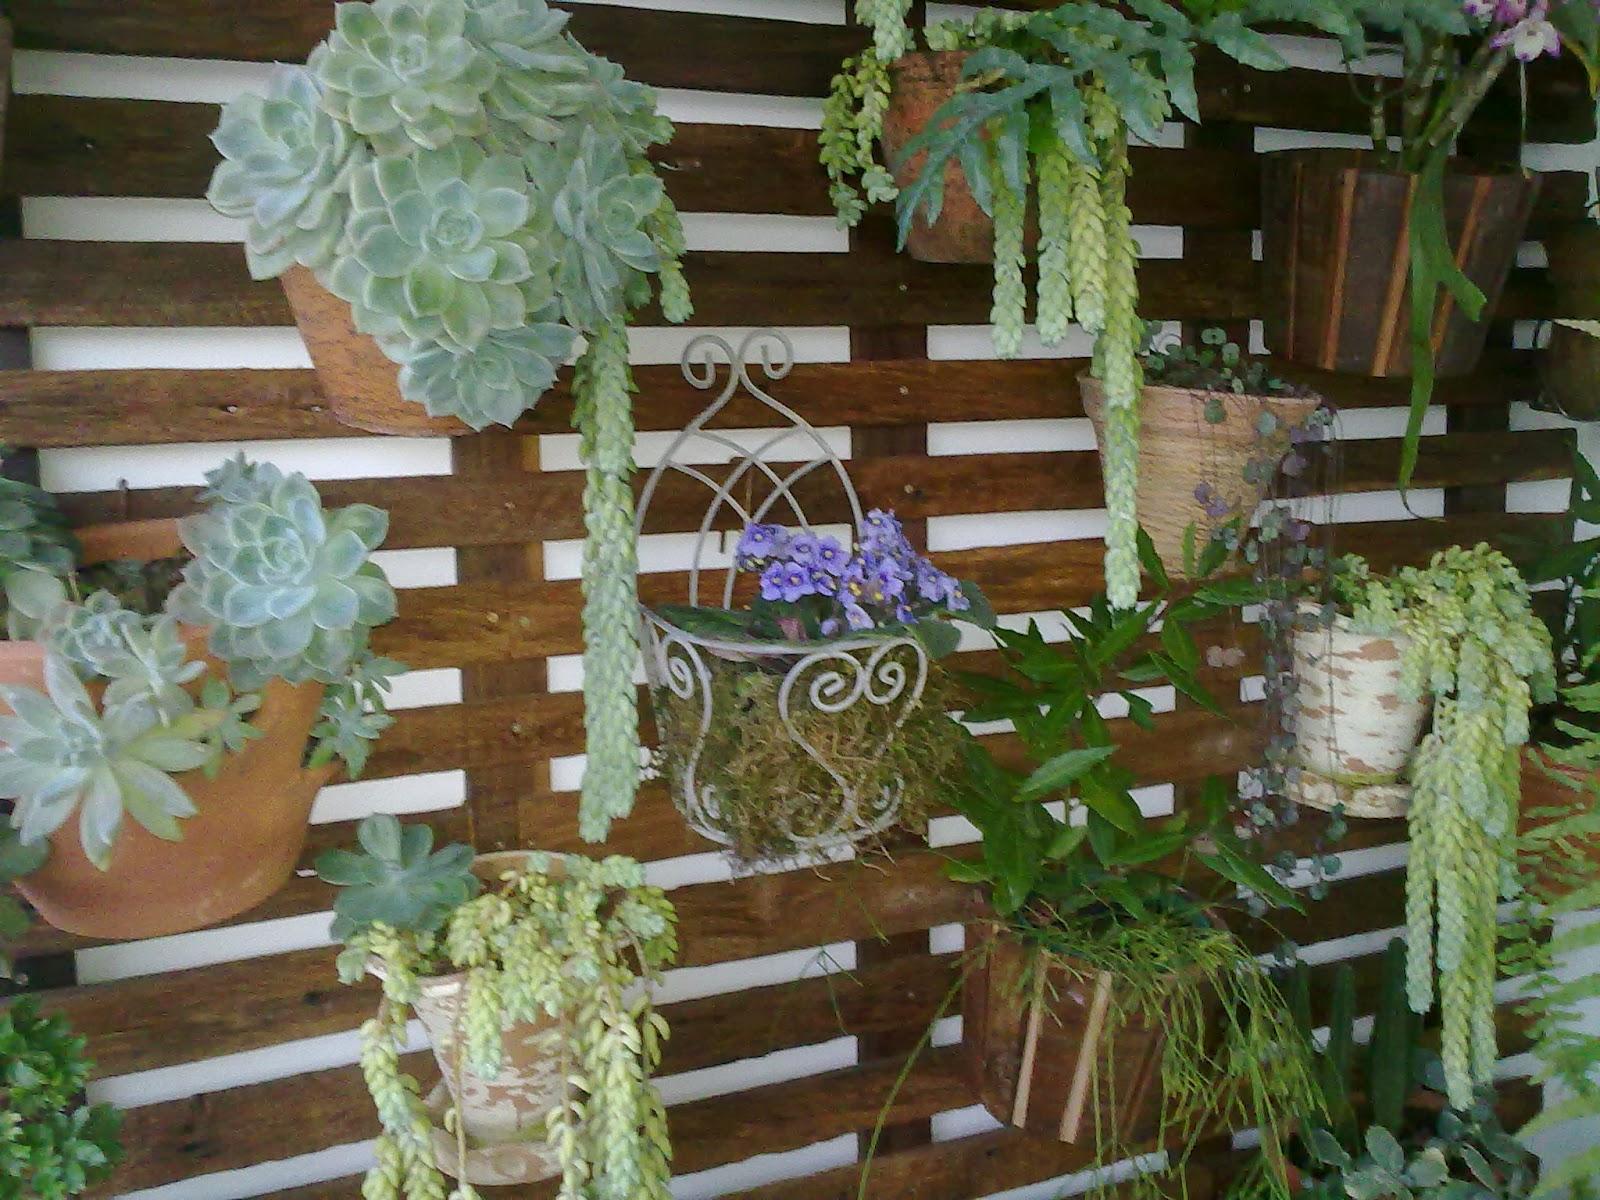 grades para jardim vertical:segunda-feira, 13 de agosto de 2012